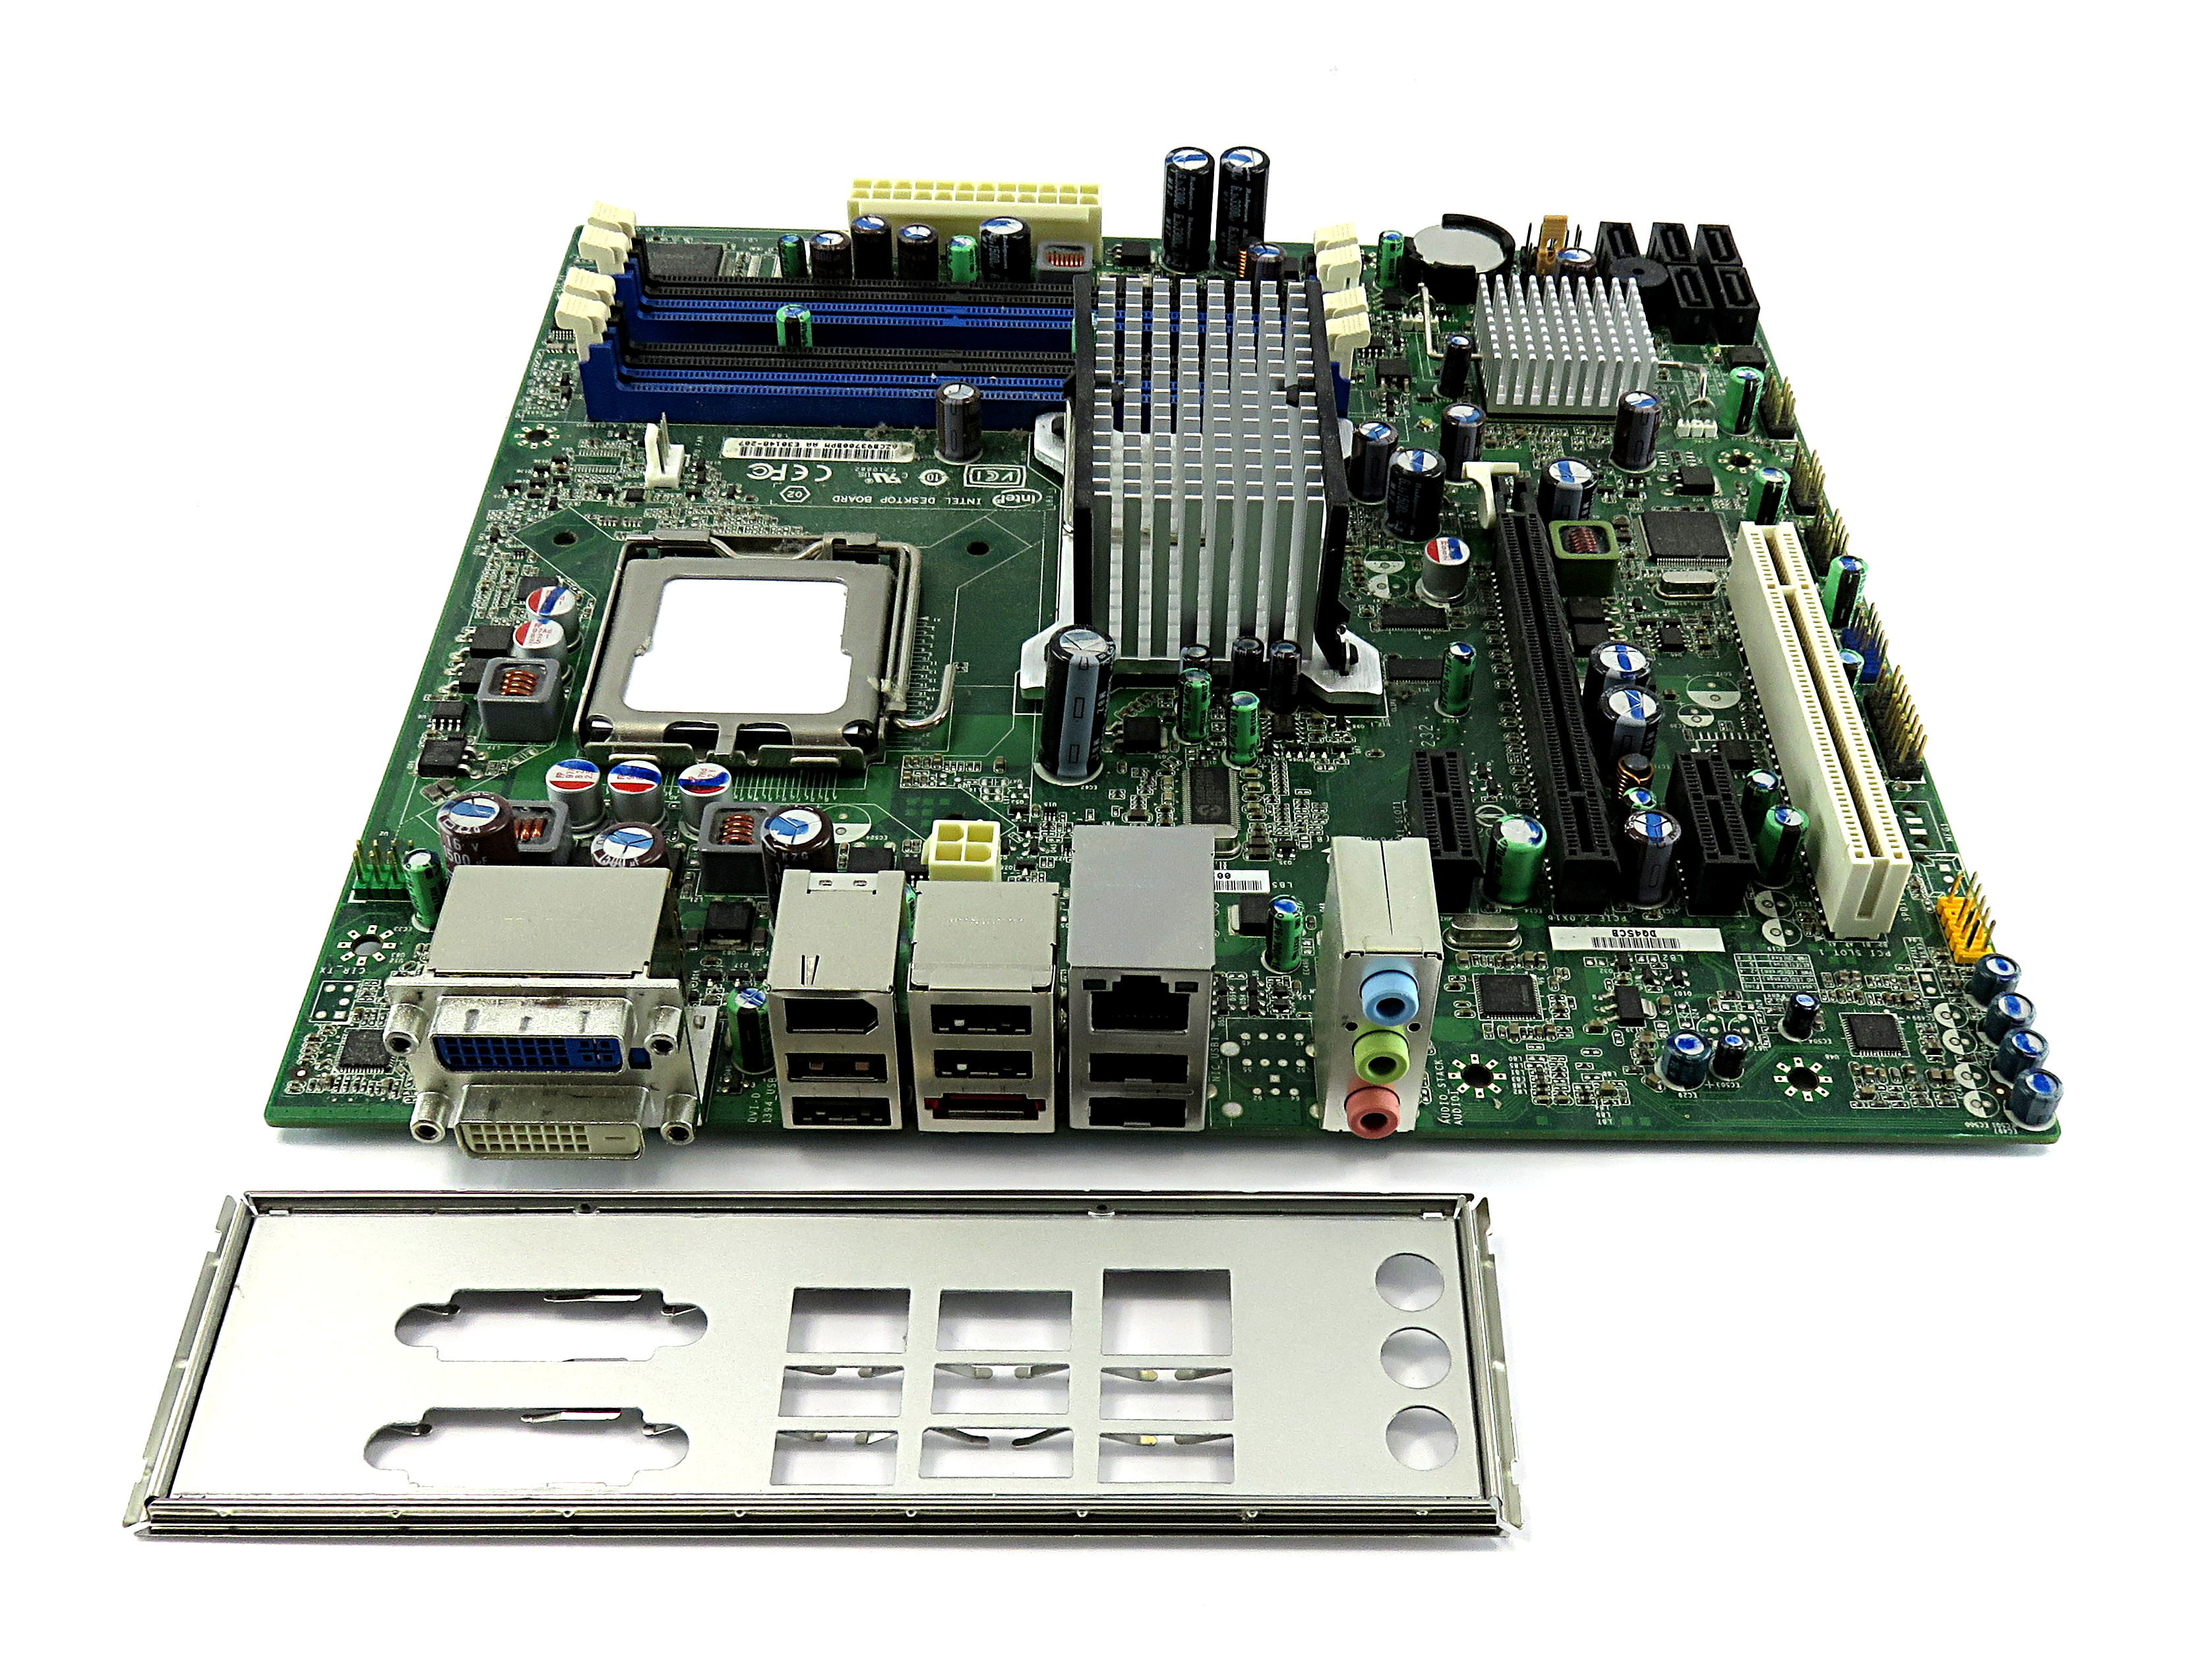 E30148-207 Viglen Intel Socket Desktop LGA775 Motherboard - DQ45CB